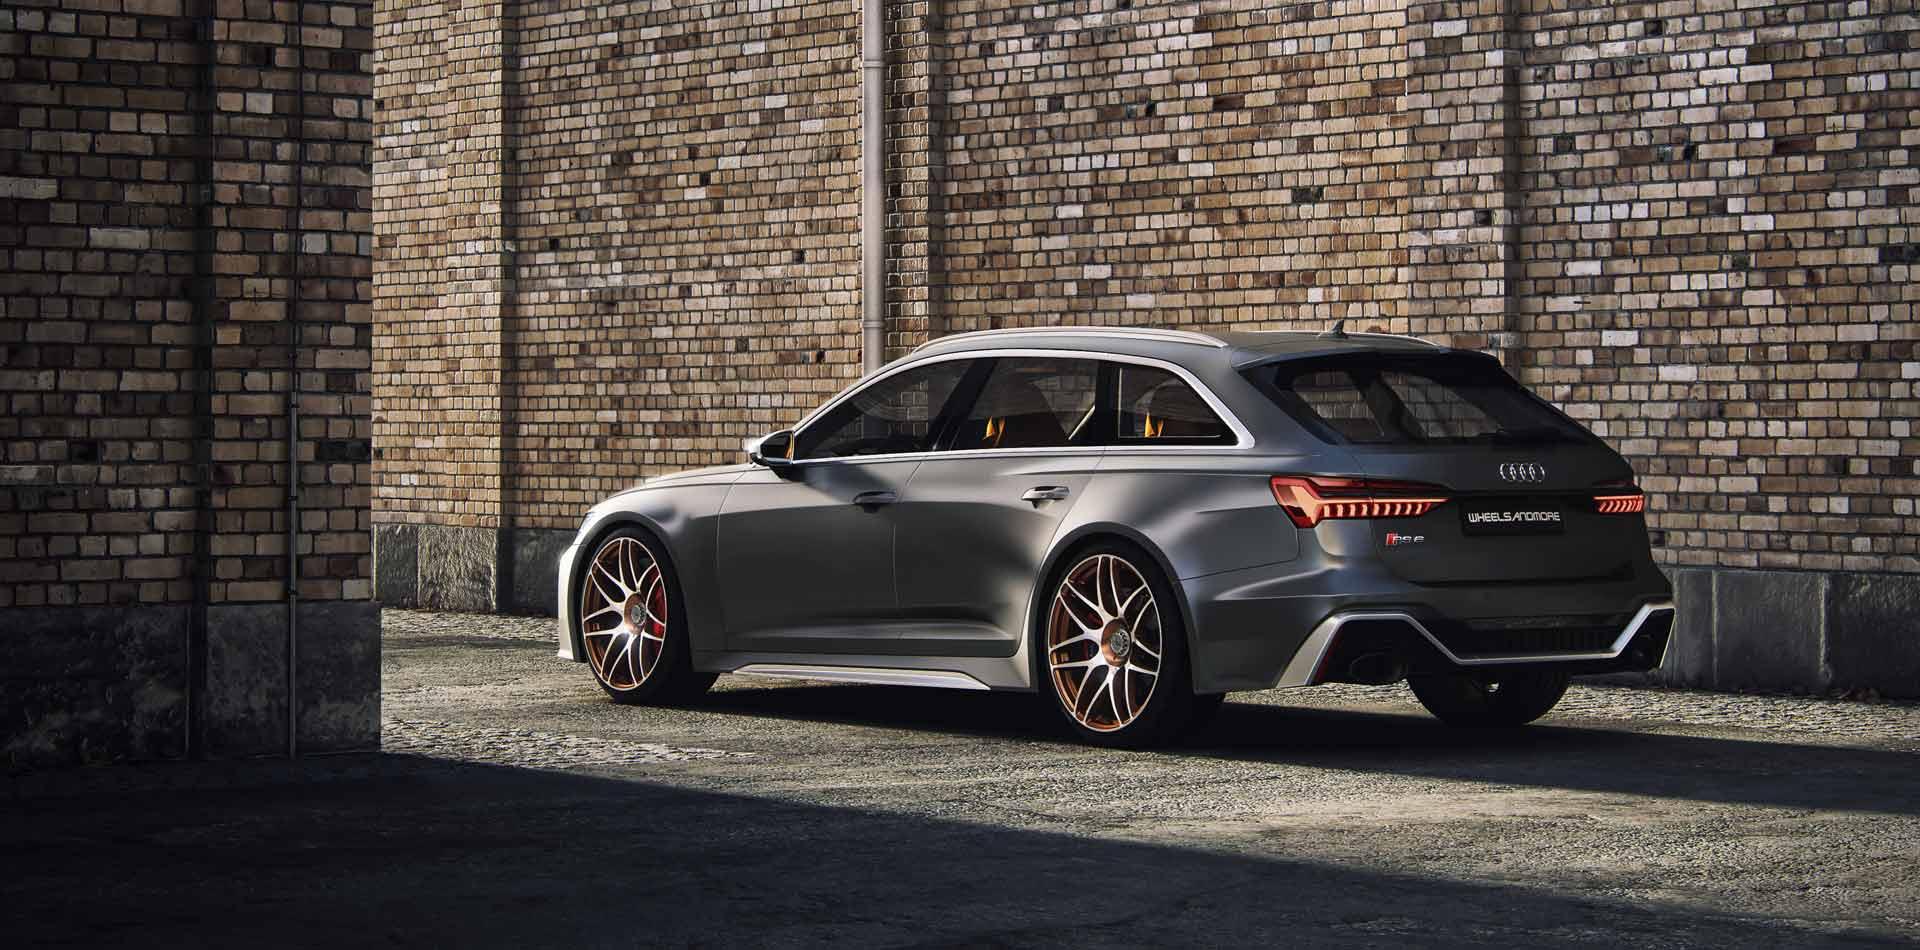 Audi-RS6-Avant-by-Wheelsandmore-6